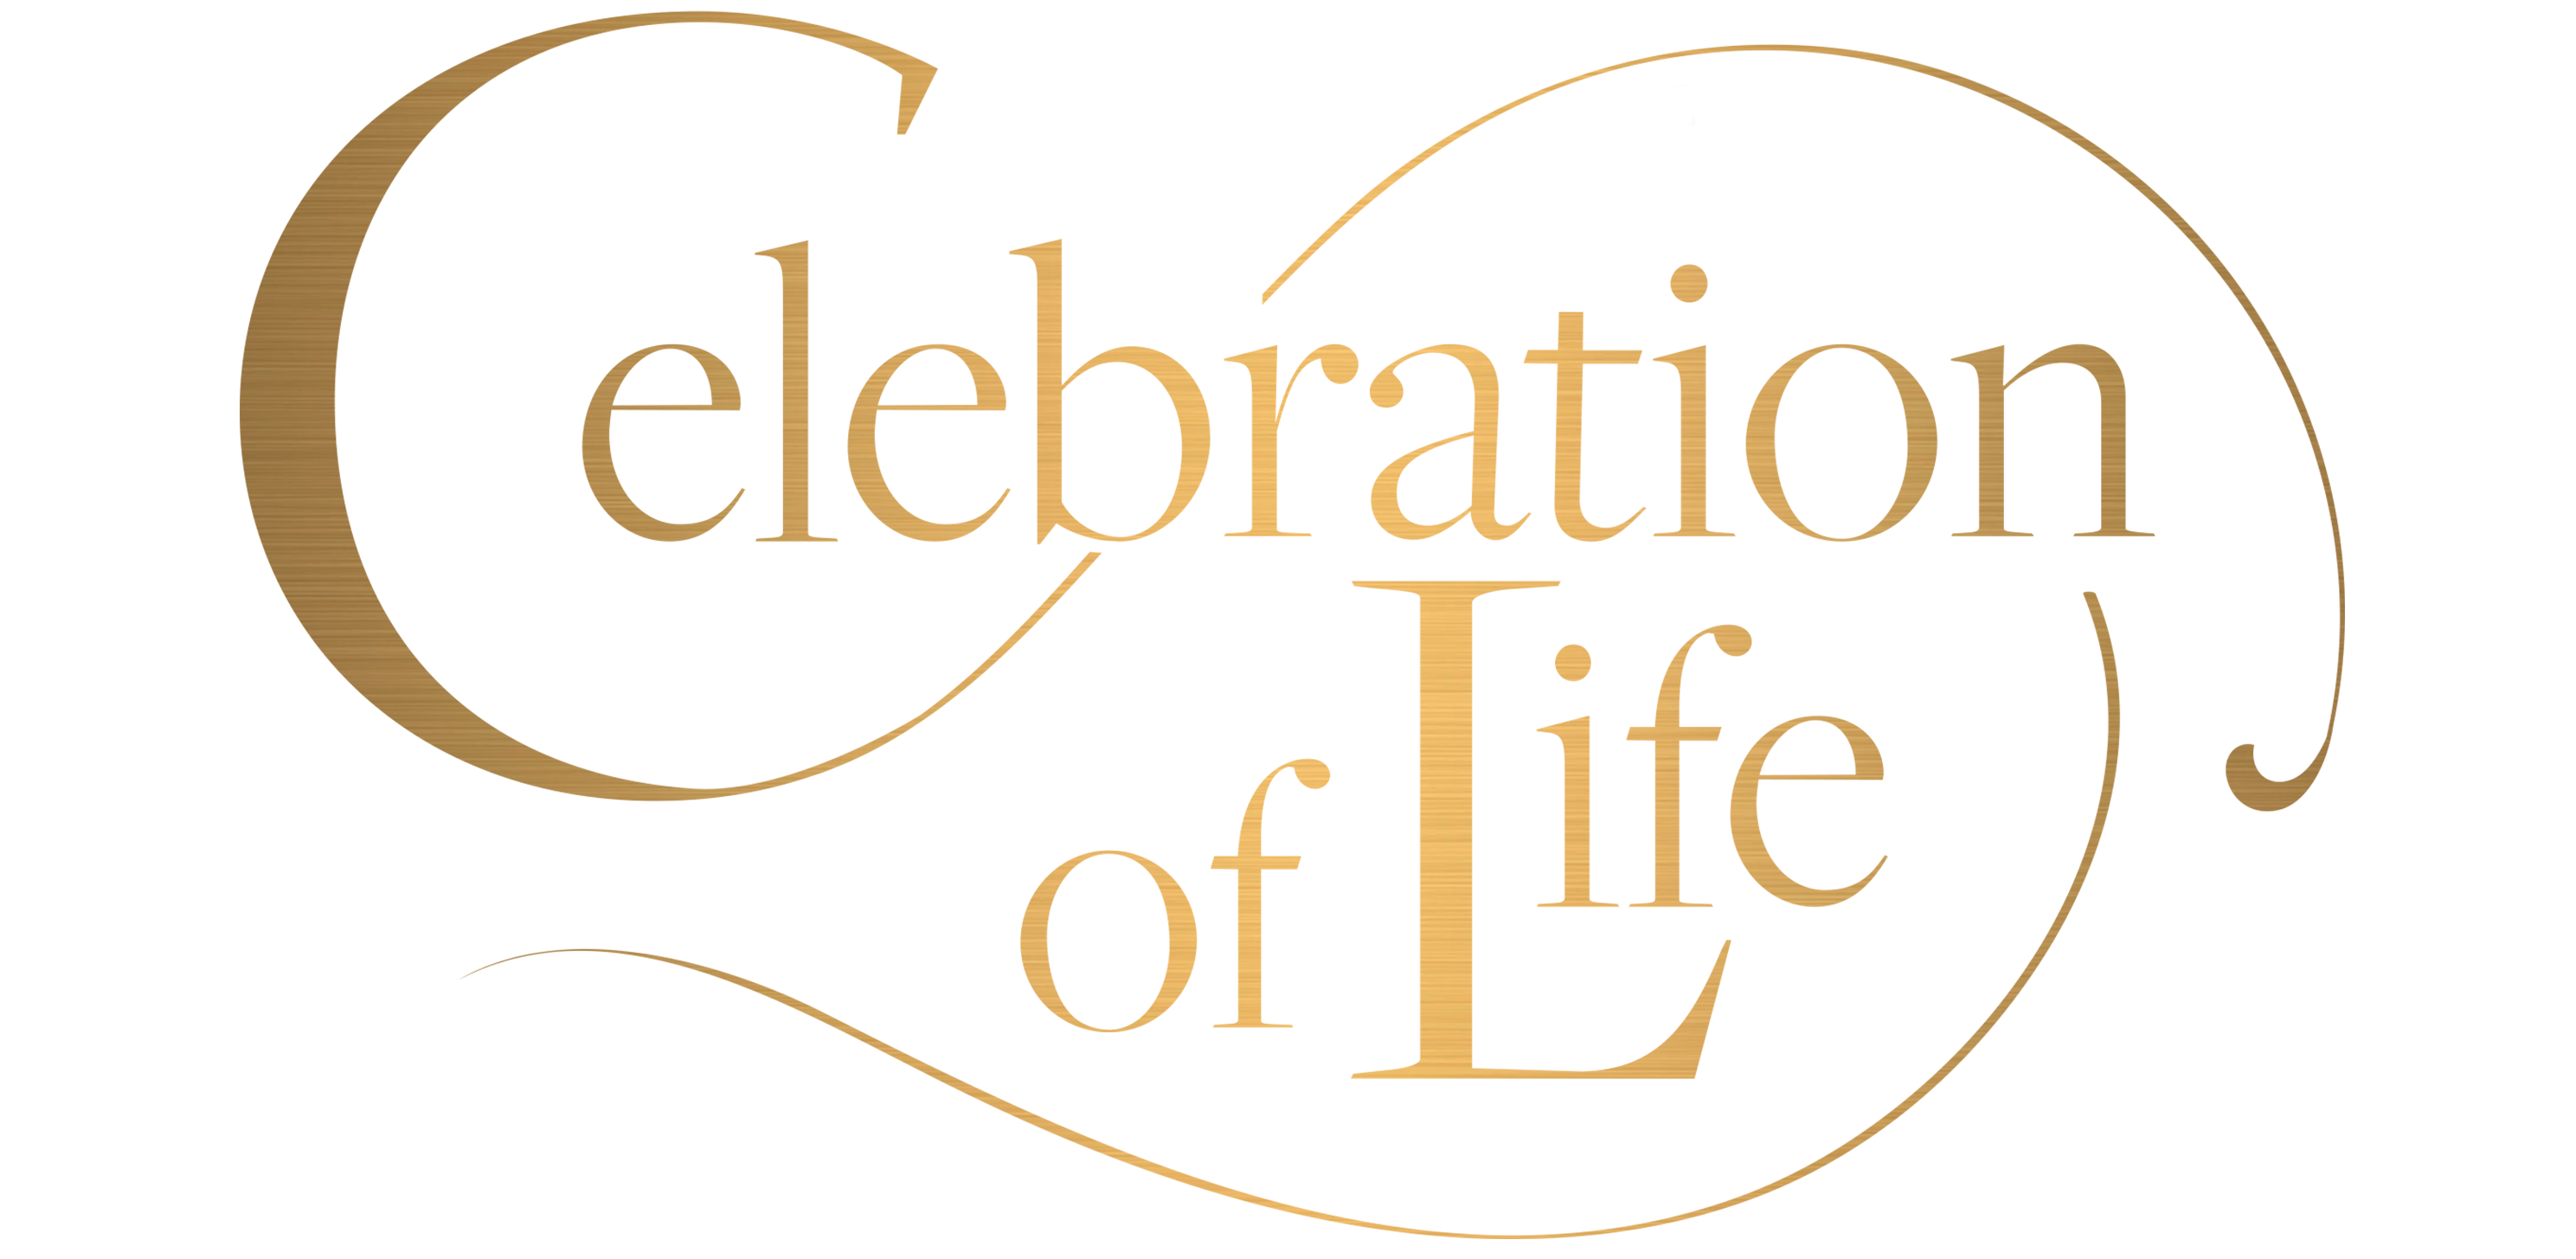 1b2d93 7d23a41299e24e5383bc7763353c76d5~mv2 d 2977 1455 s 2 - Celebration Of Life